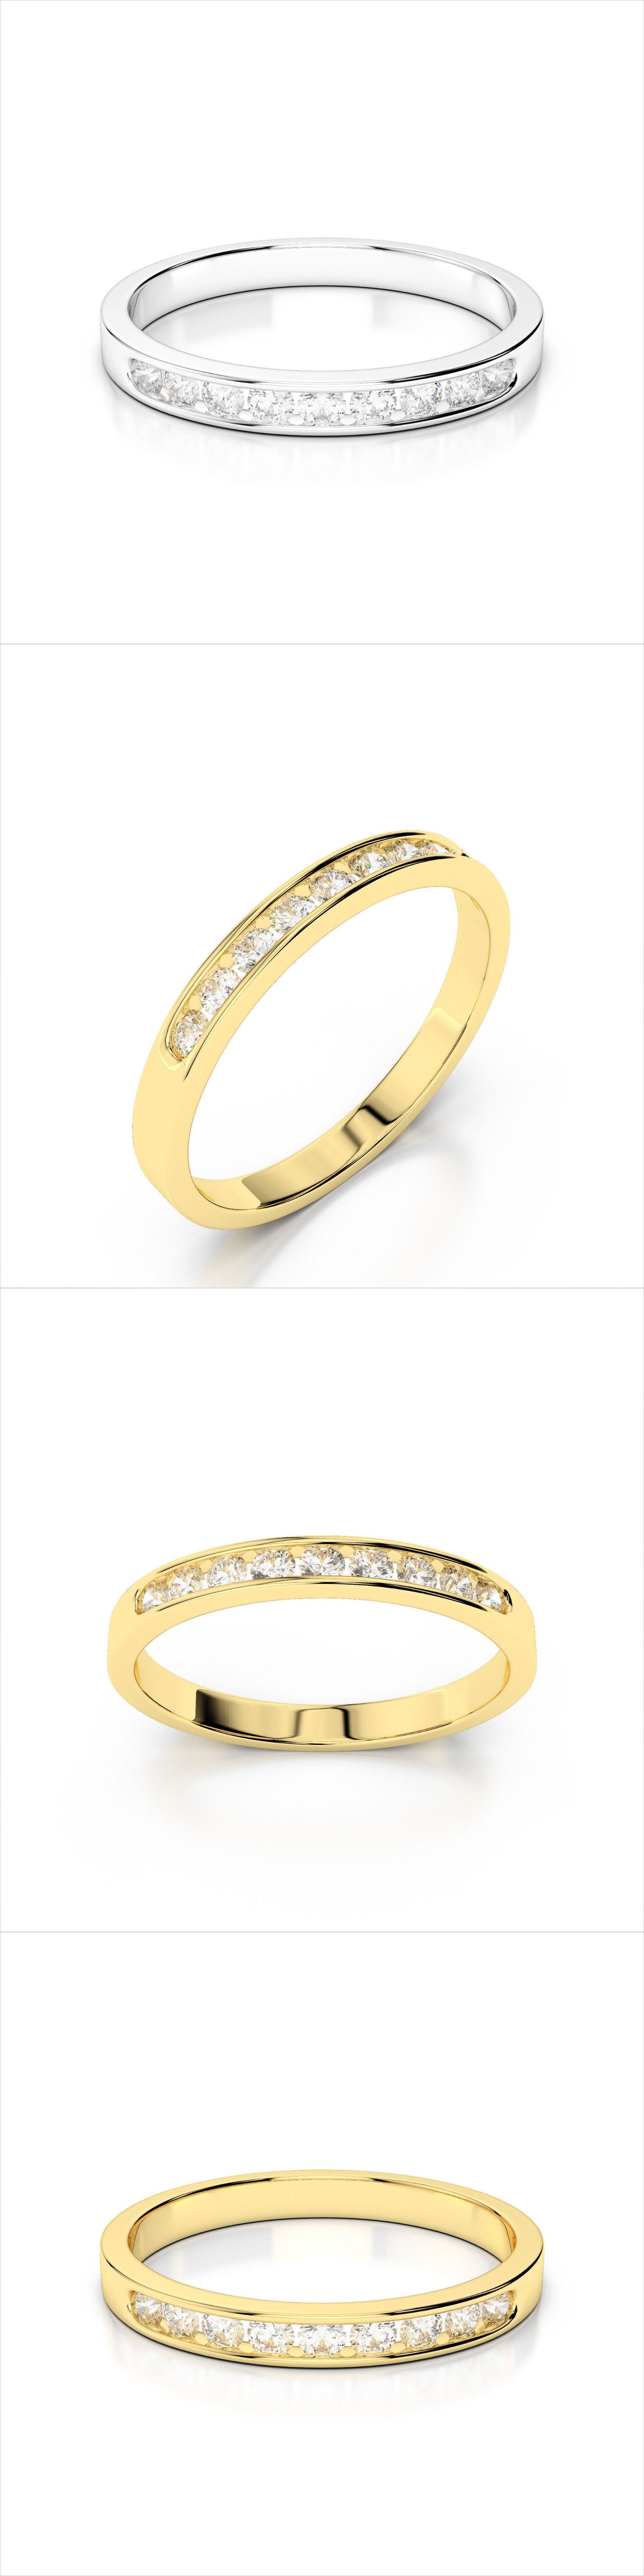 ebay wedding rings sets Wedding rings 14K White Gold 25Ctw Diamond Channel Set Wedding Band Ring